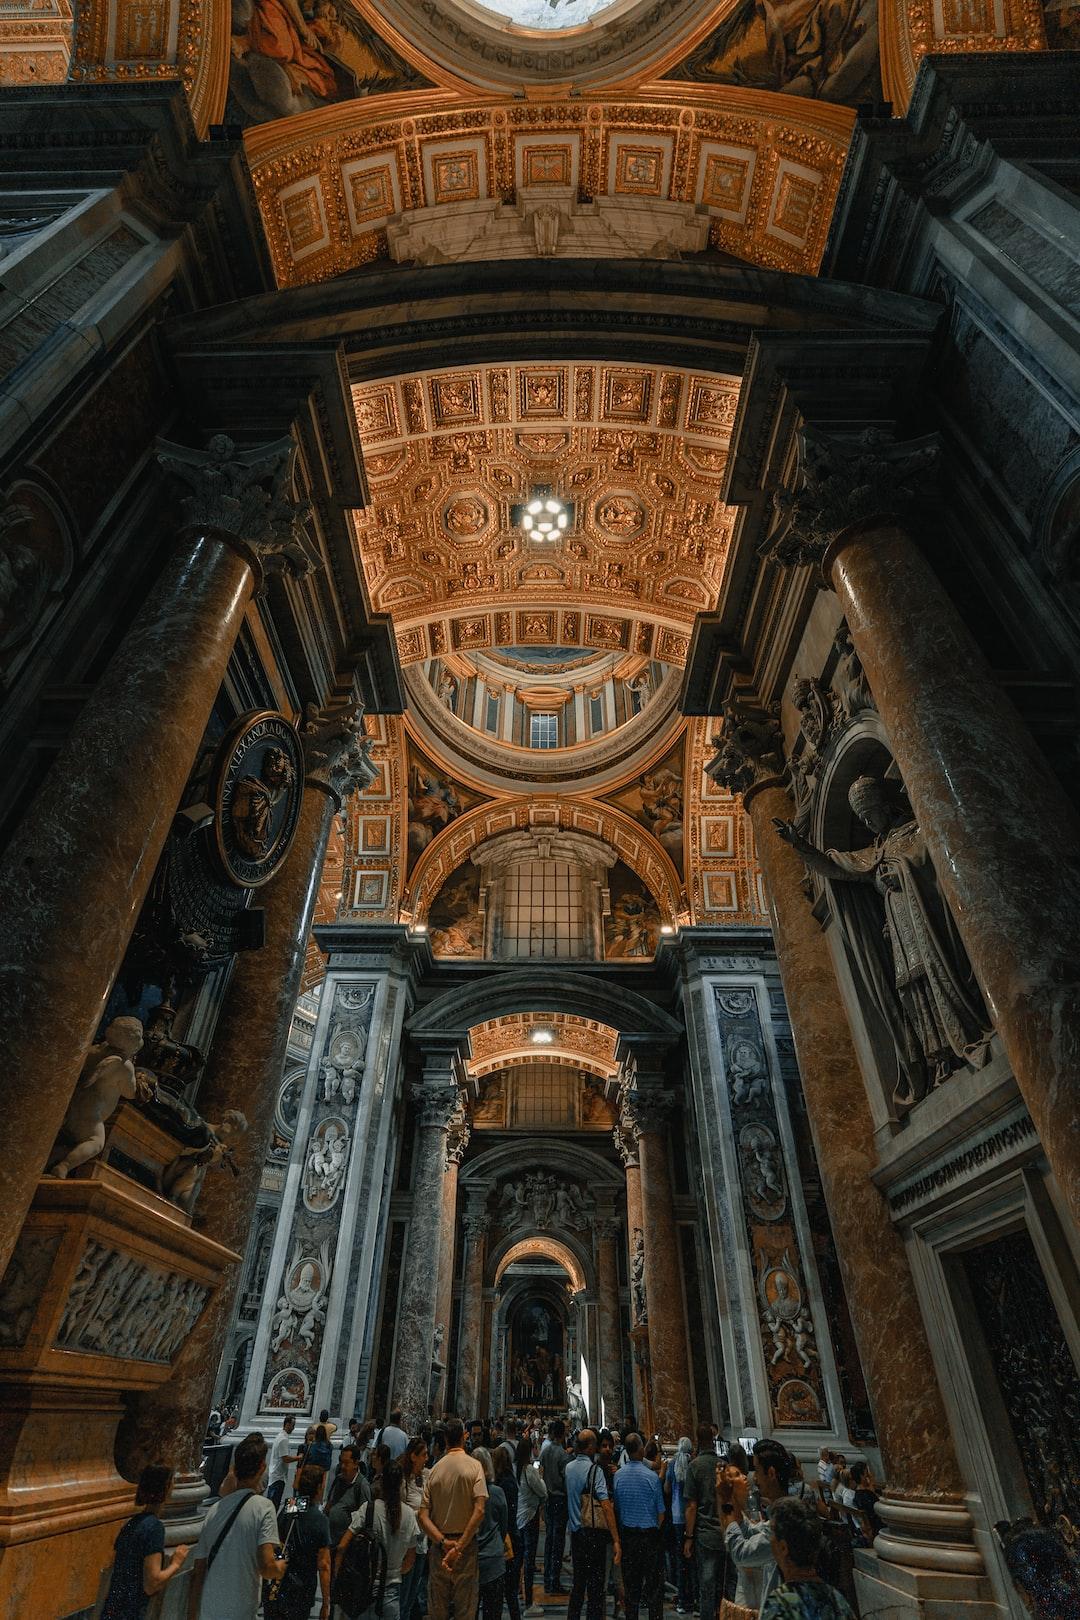 St. Peter's Basilica (3/3)